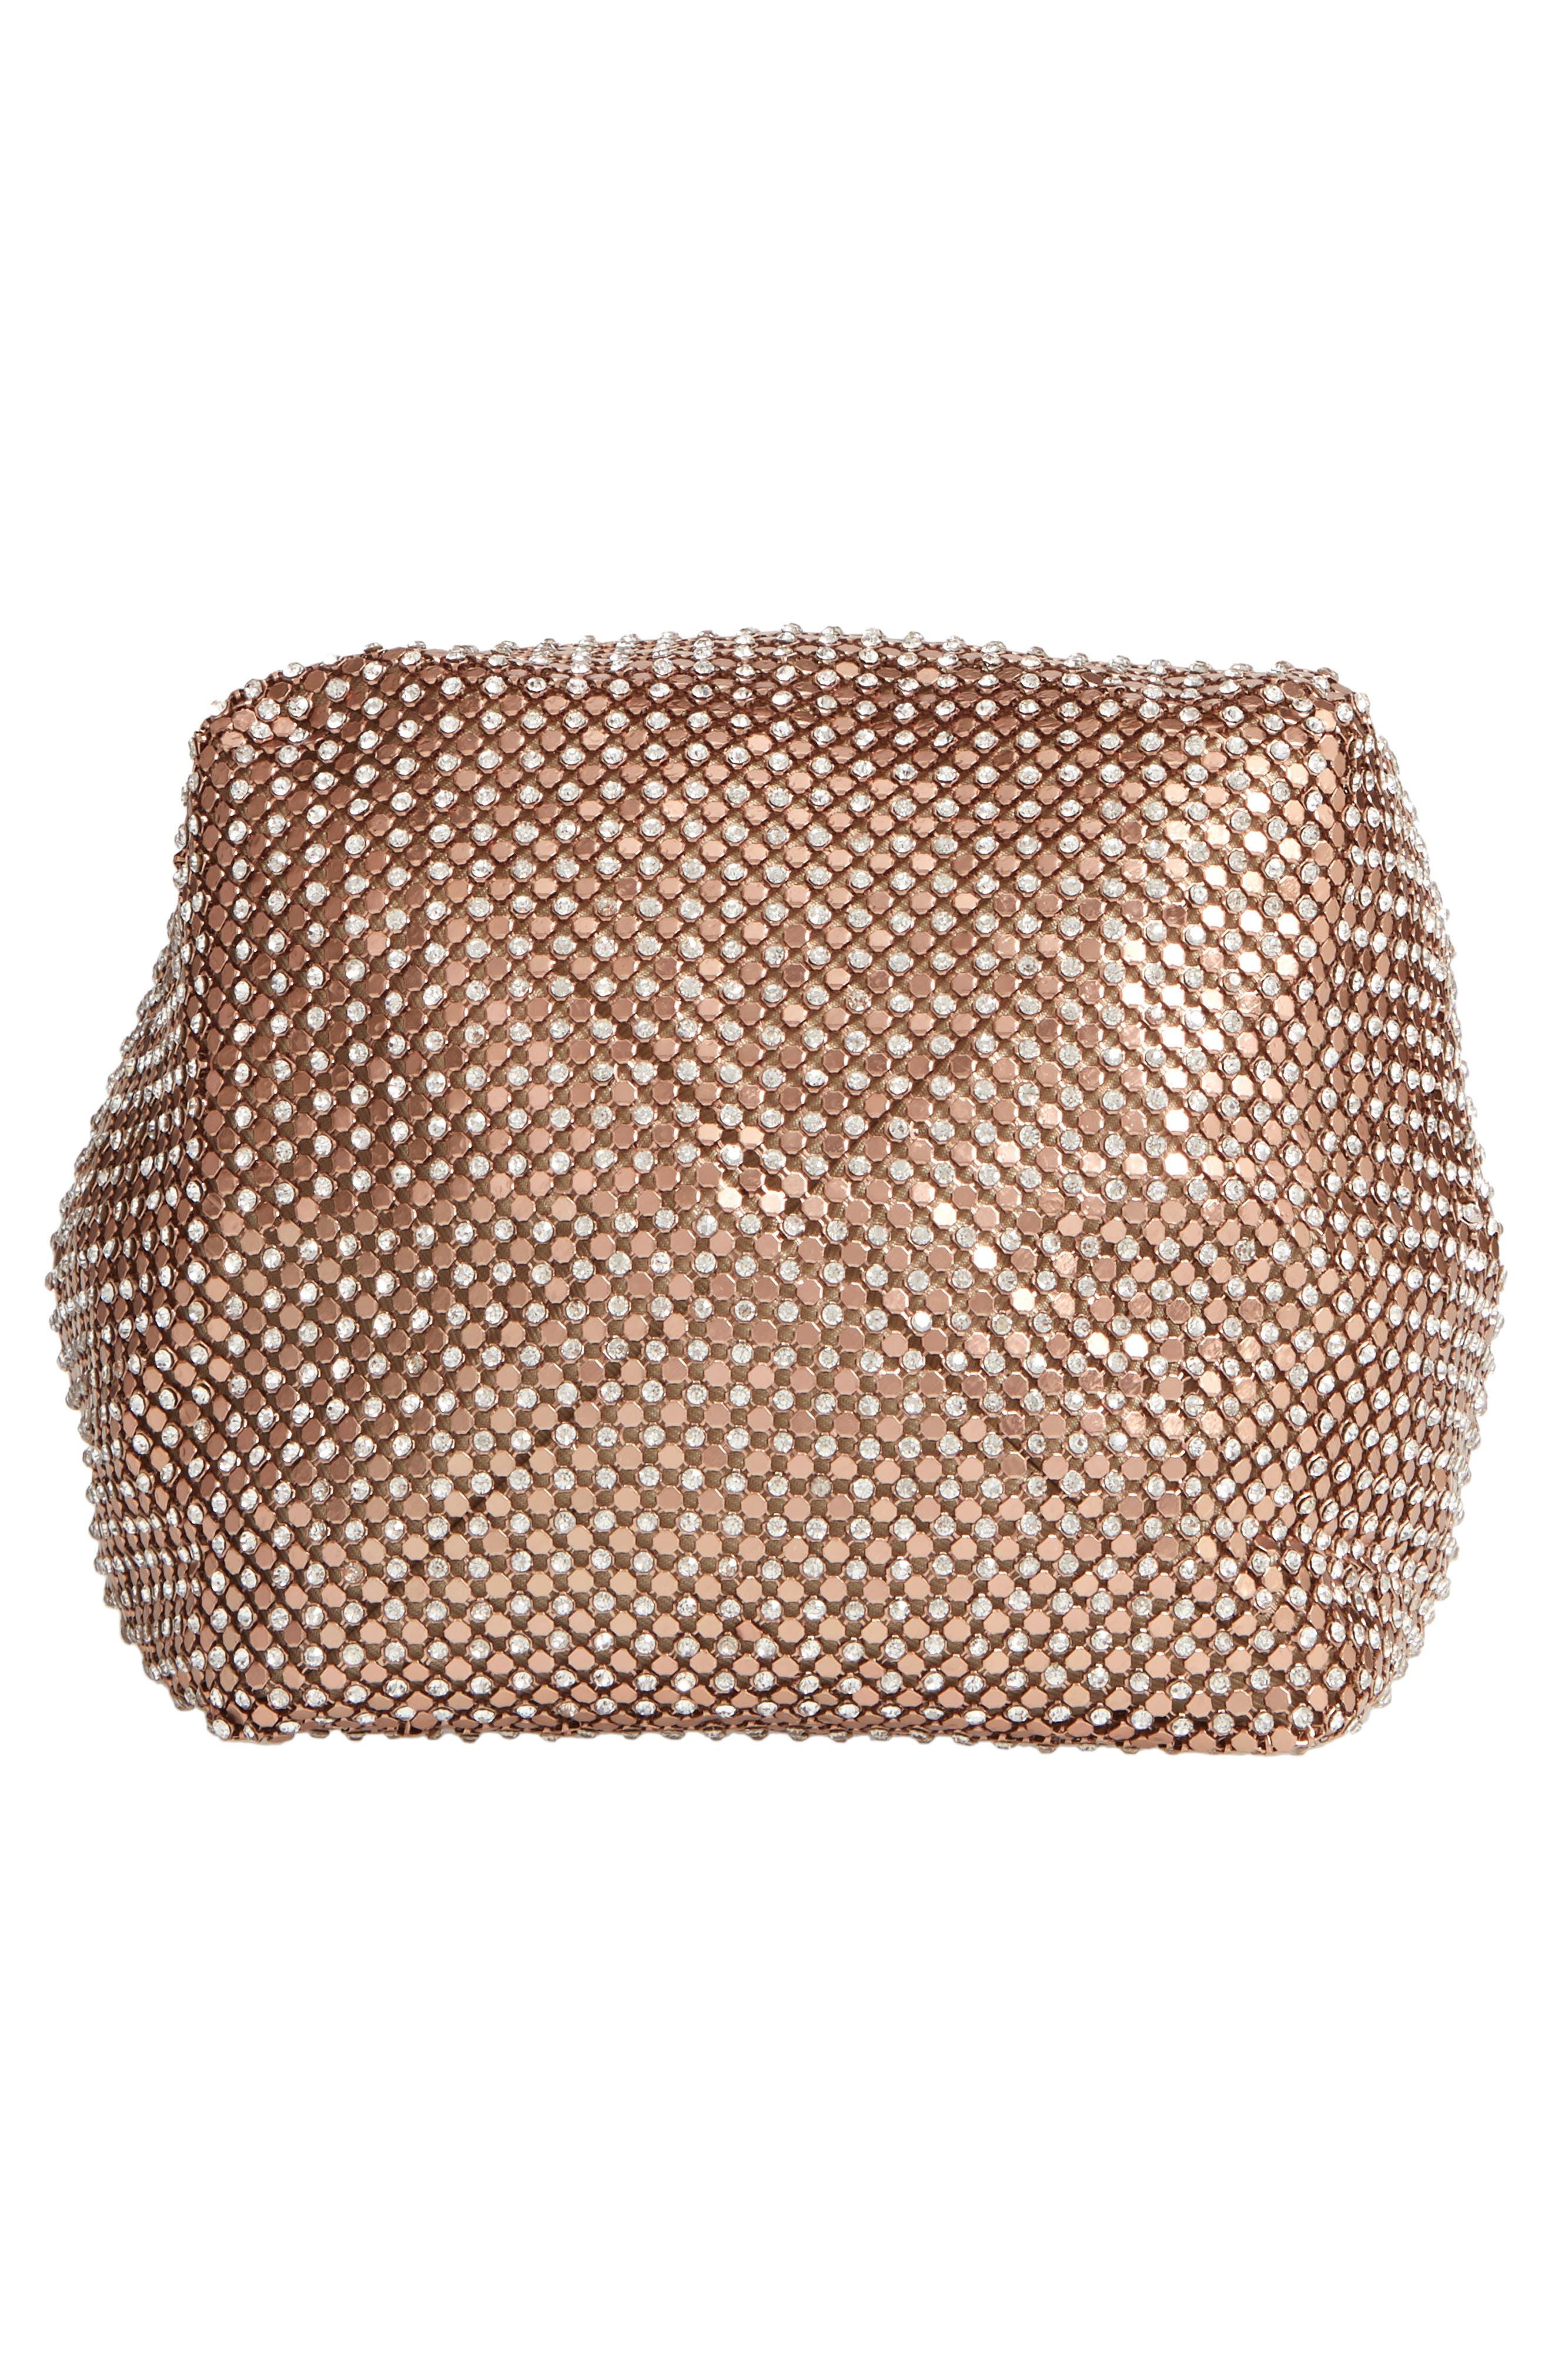 Crystal Mesh Crossbody Bucket Bag,                             Alternate thumbnail 6, color,                             ROSE GOLD